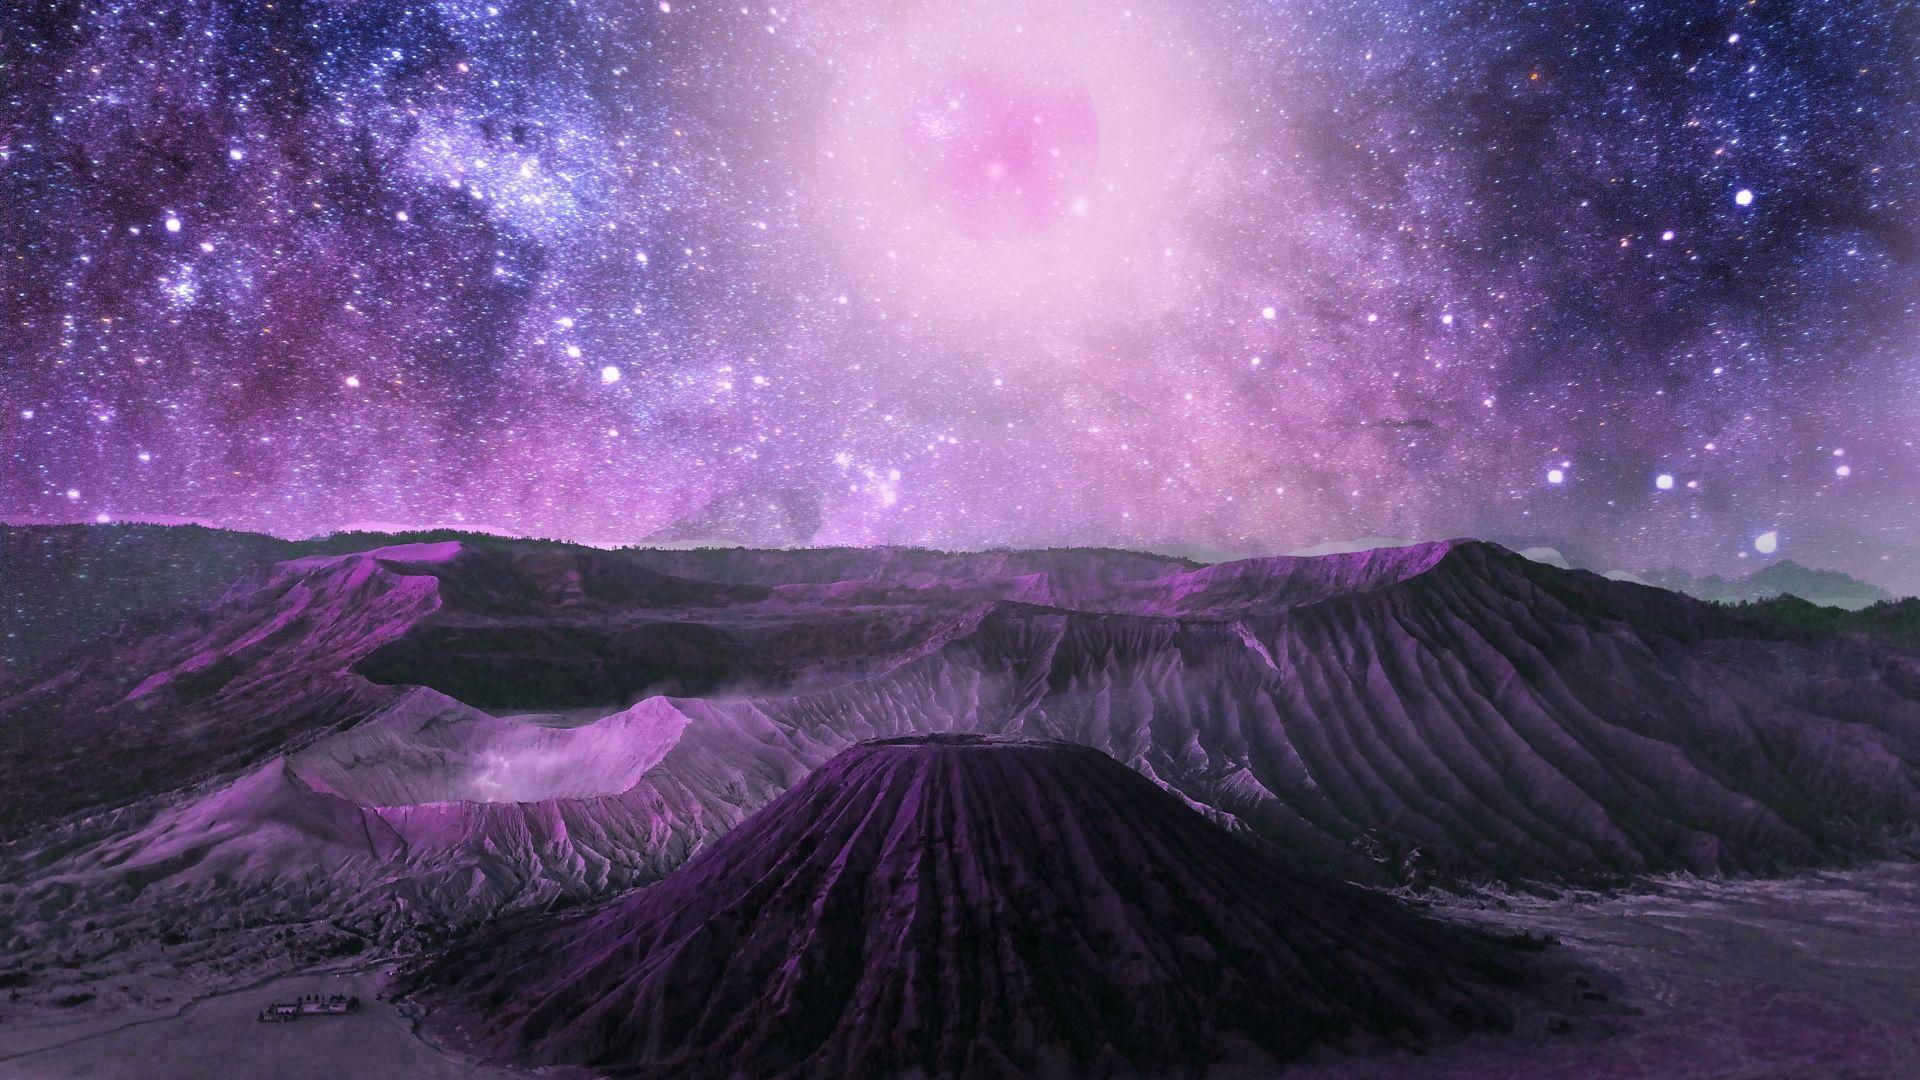 Galaxy Mountains Stars Space Cosmos 4k Wallpaper